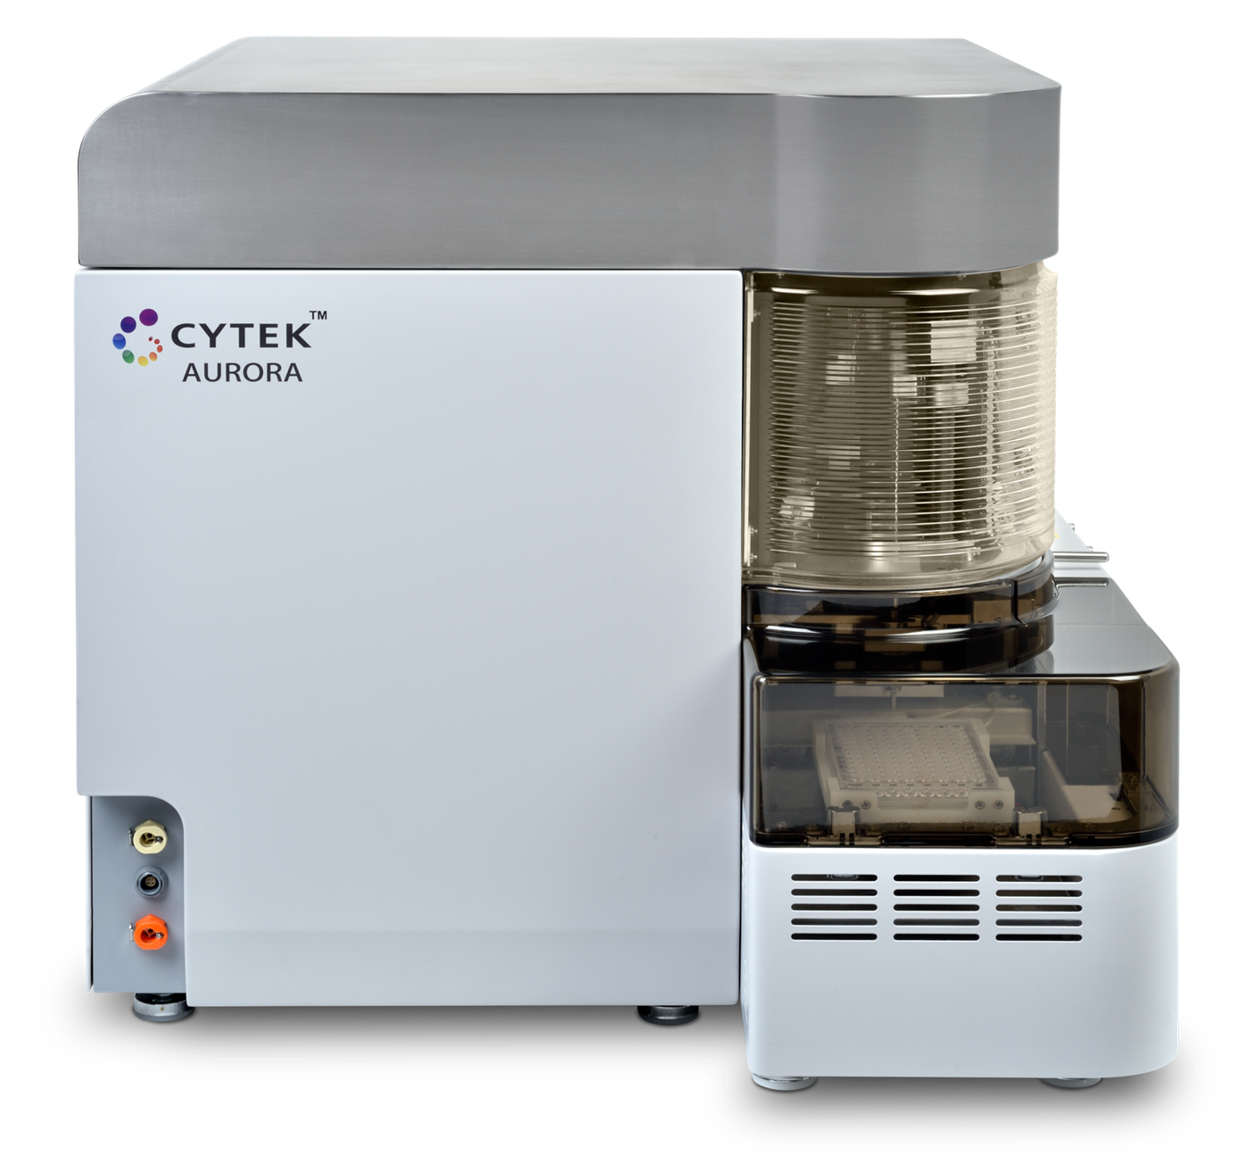 Cytek Aurora 全光谱流式细胞仪